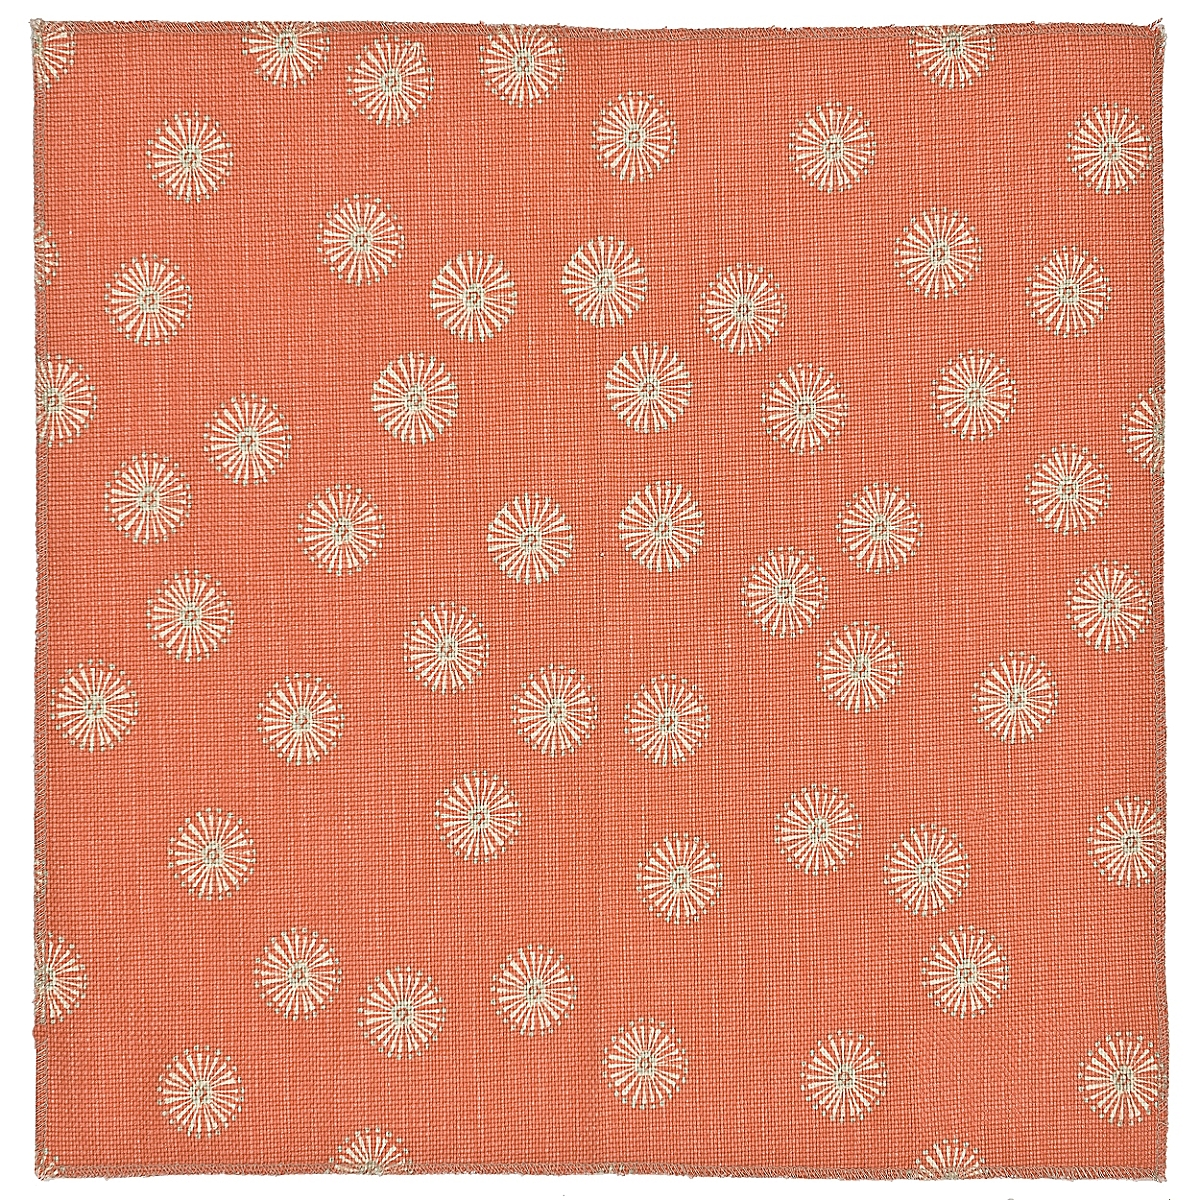 Dilly: Zinnia (fabric yardage)